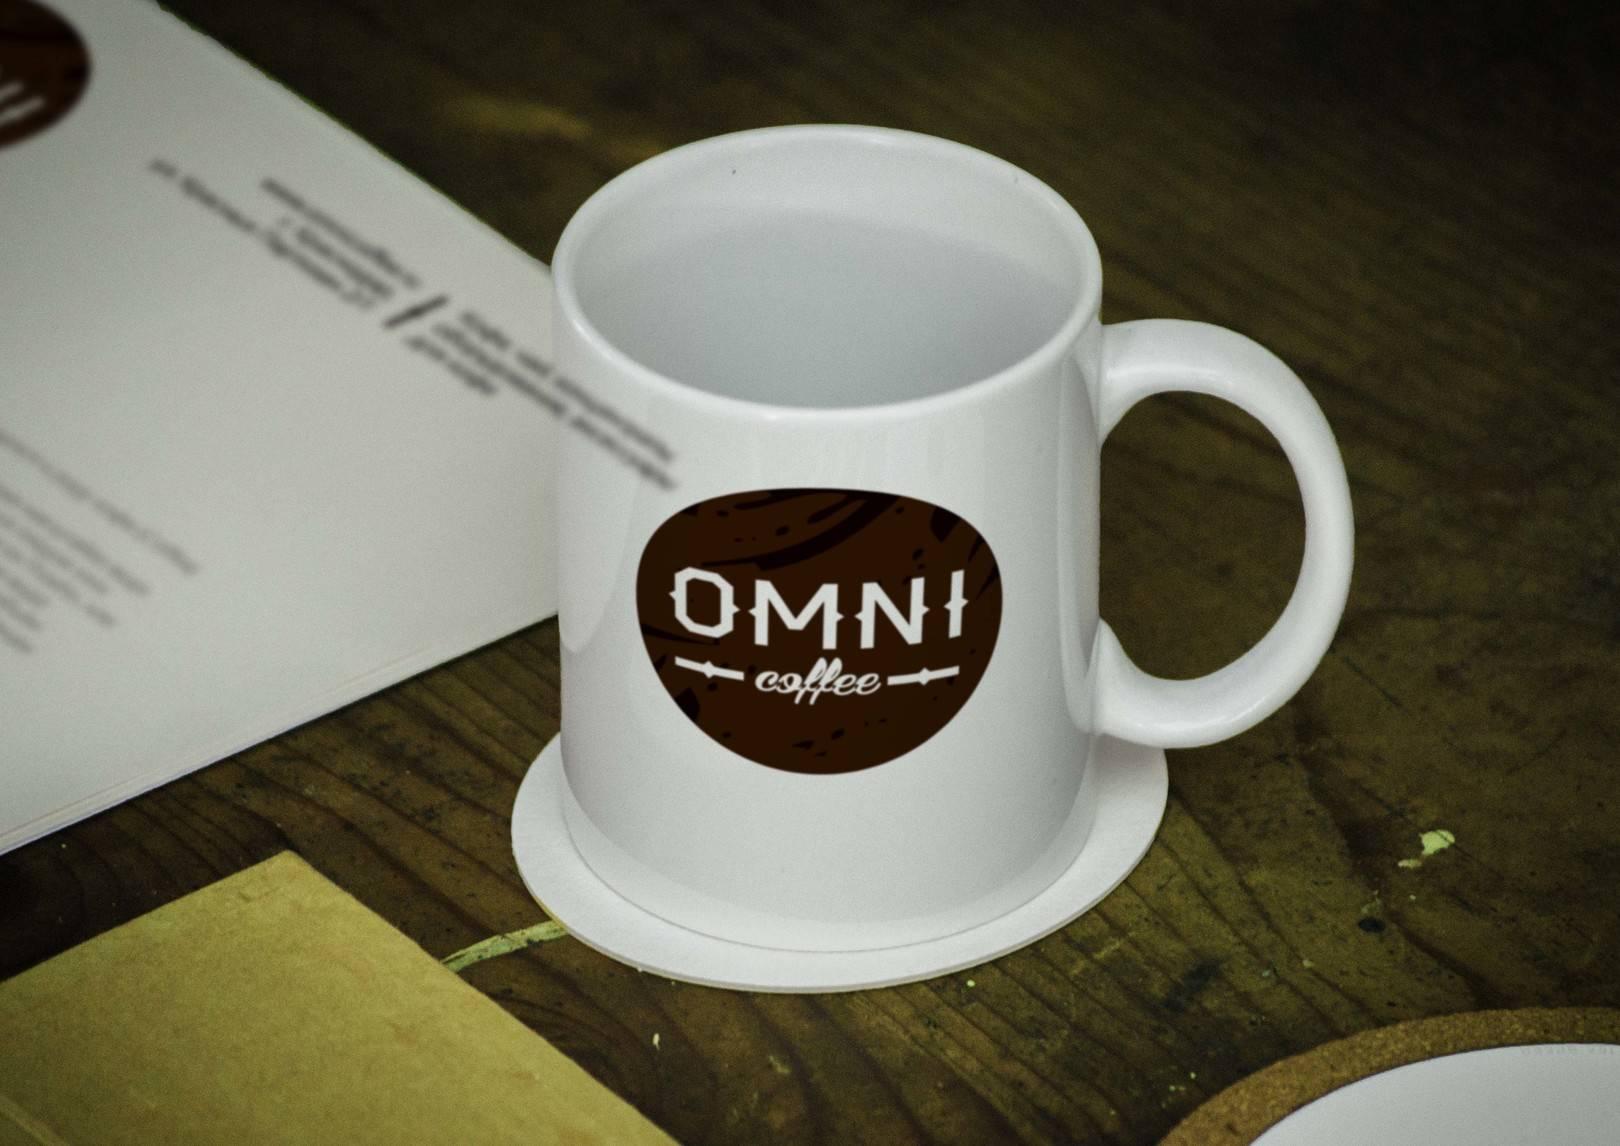 Фирменный стиль Omni coffee